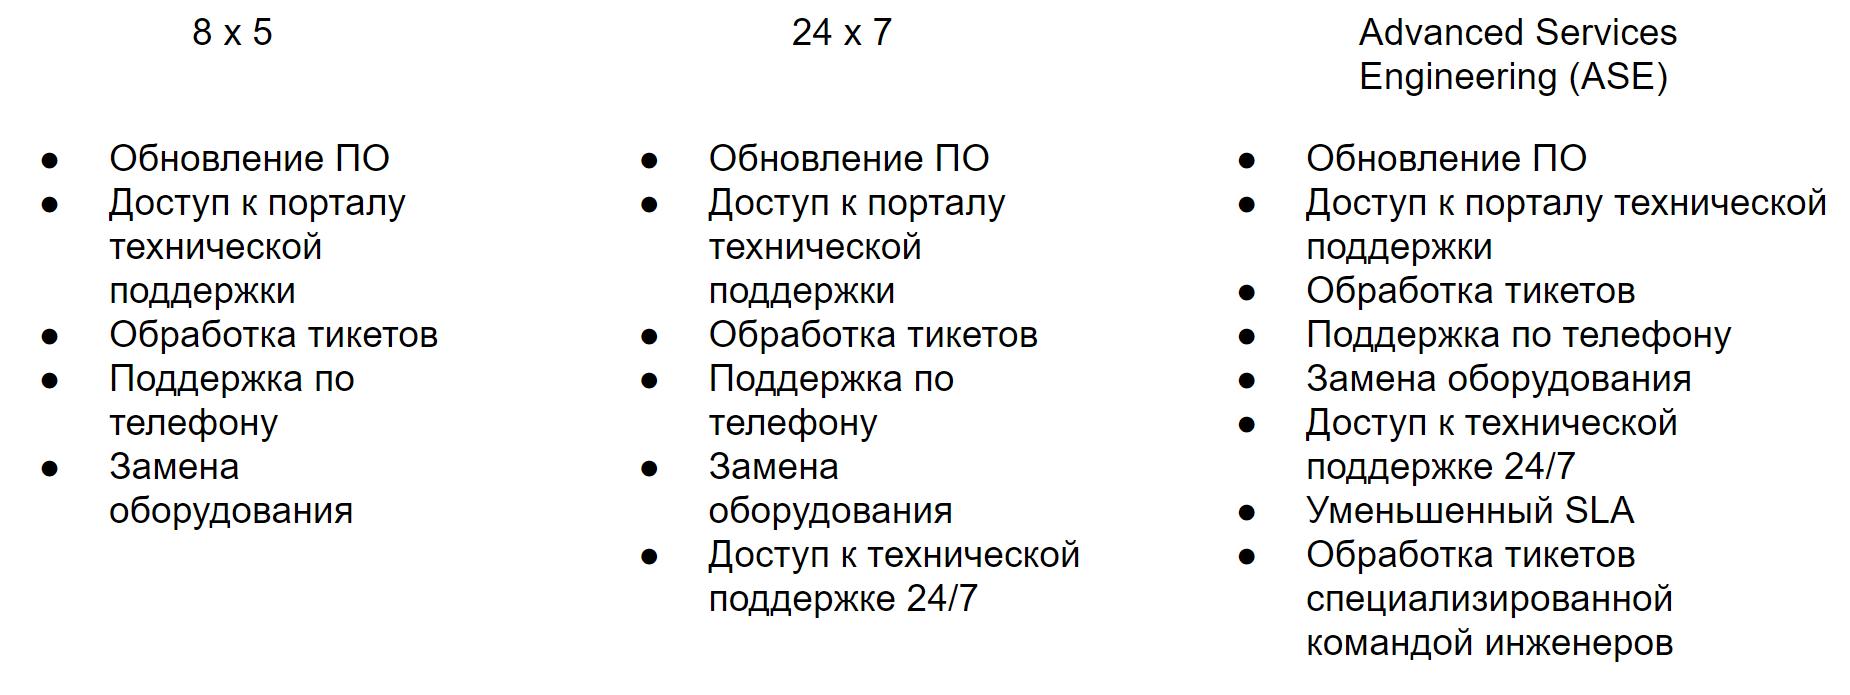 11. Fortinet Getting Started v6.0. Лицензирование - 2